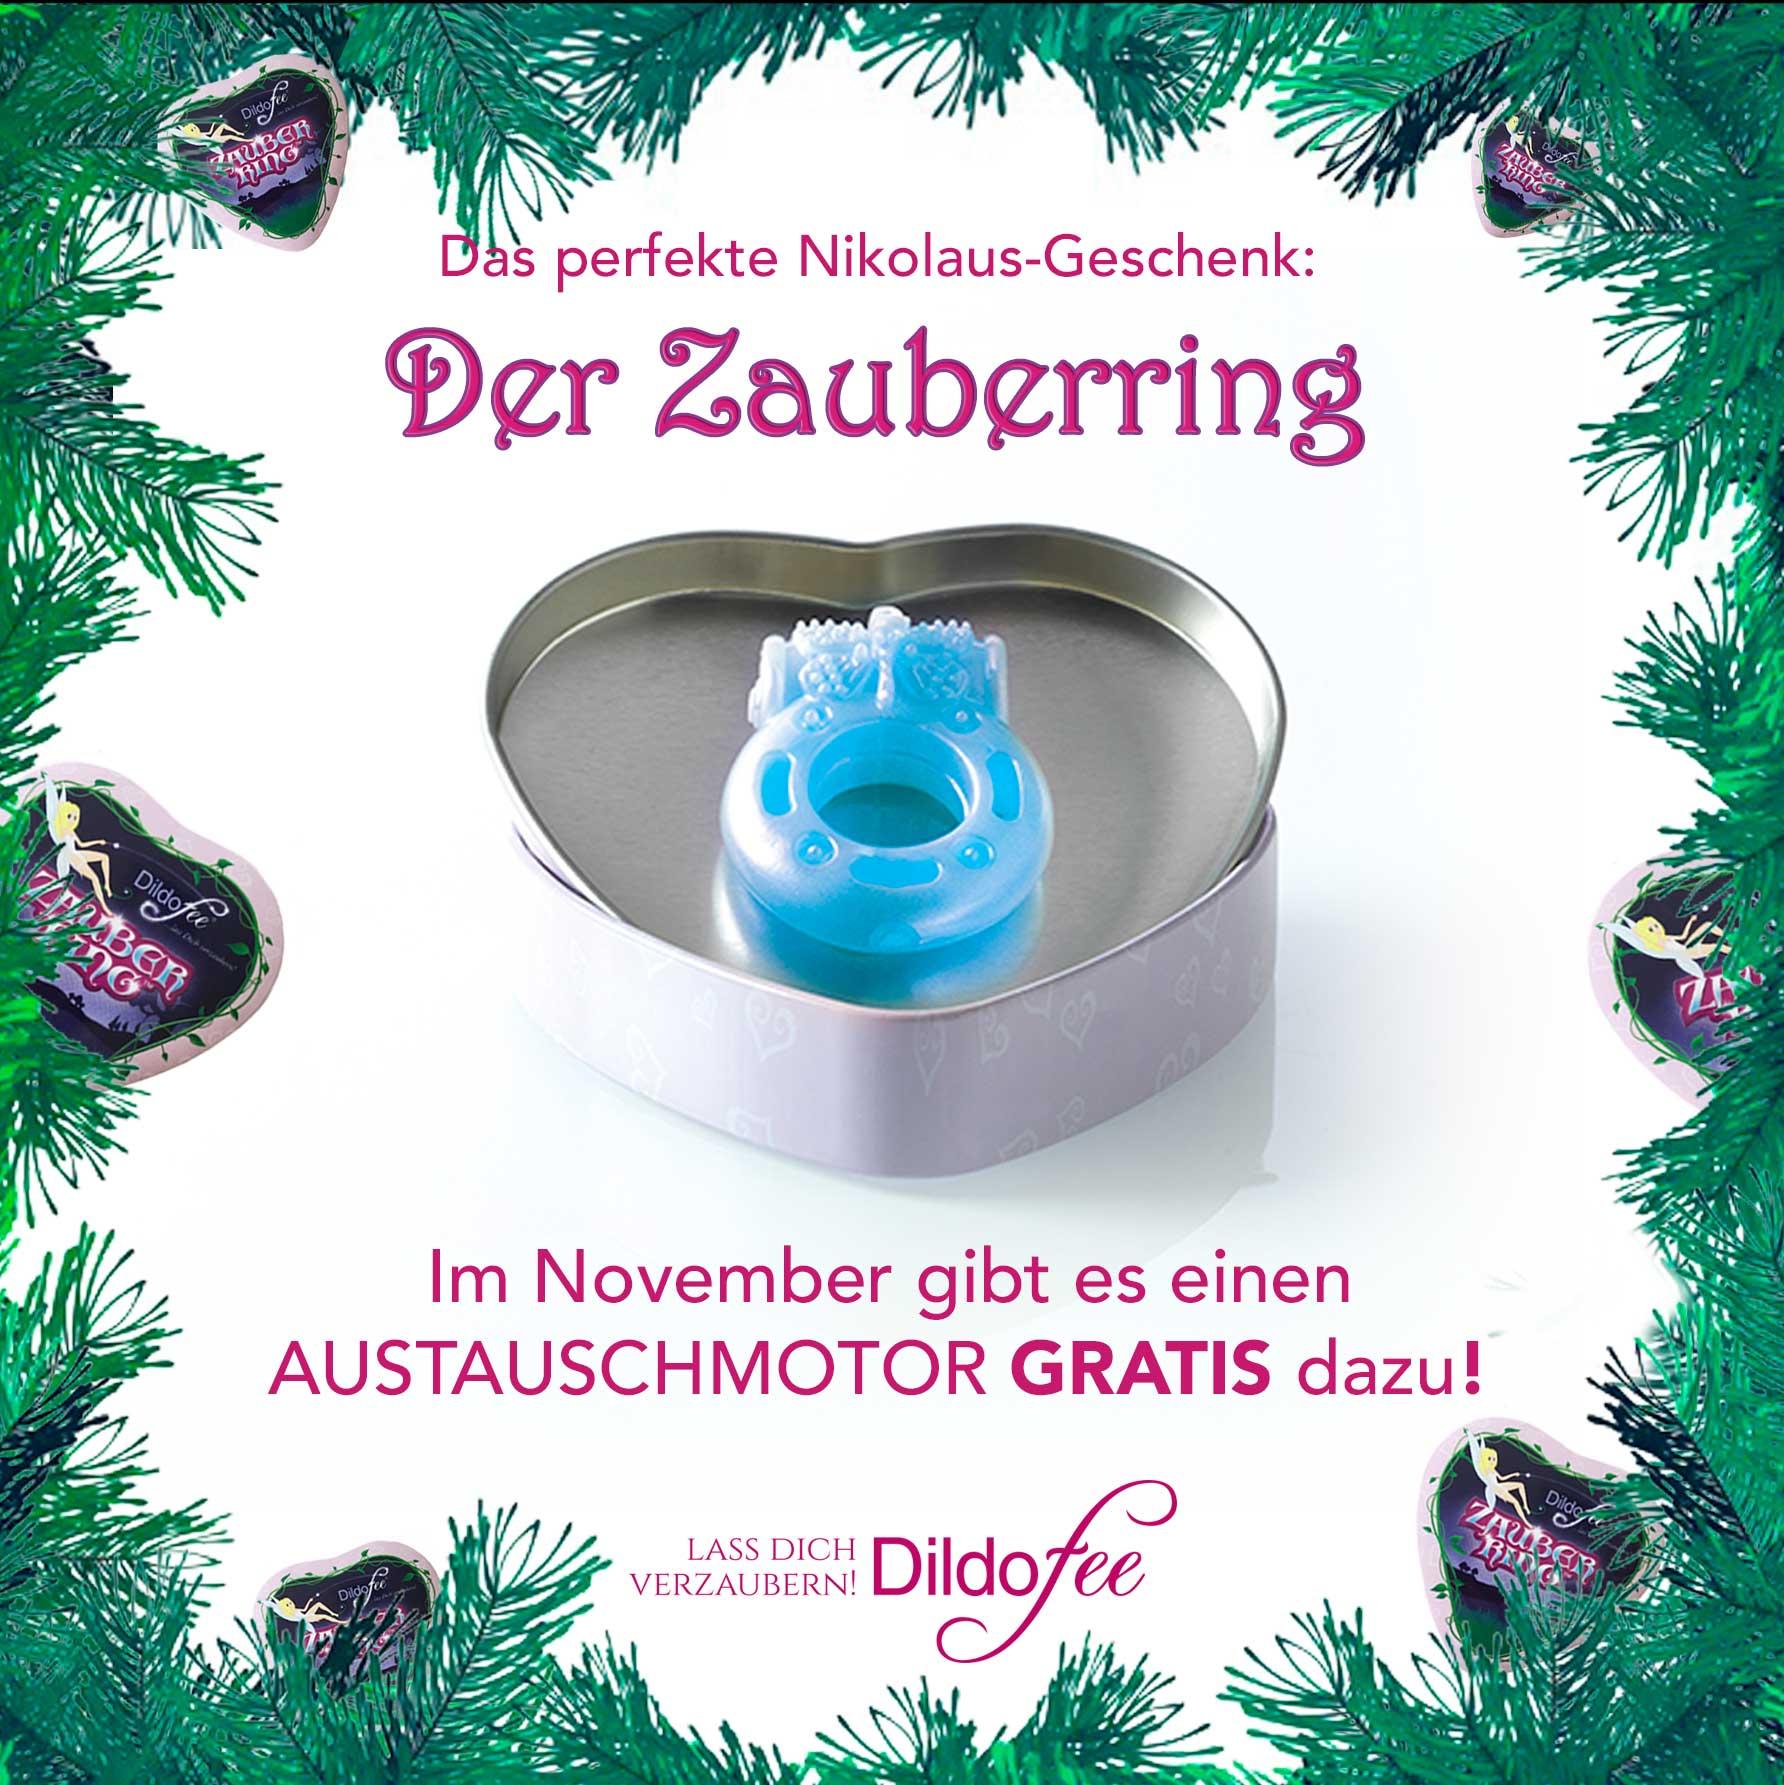 Zauberring_Austauschmotor_2020